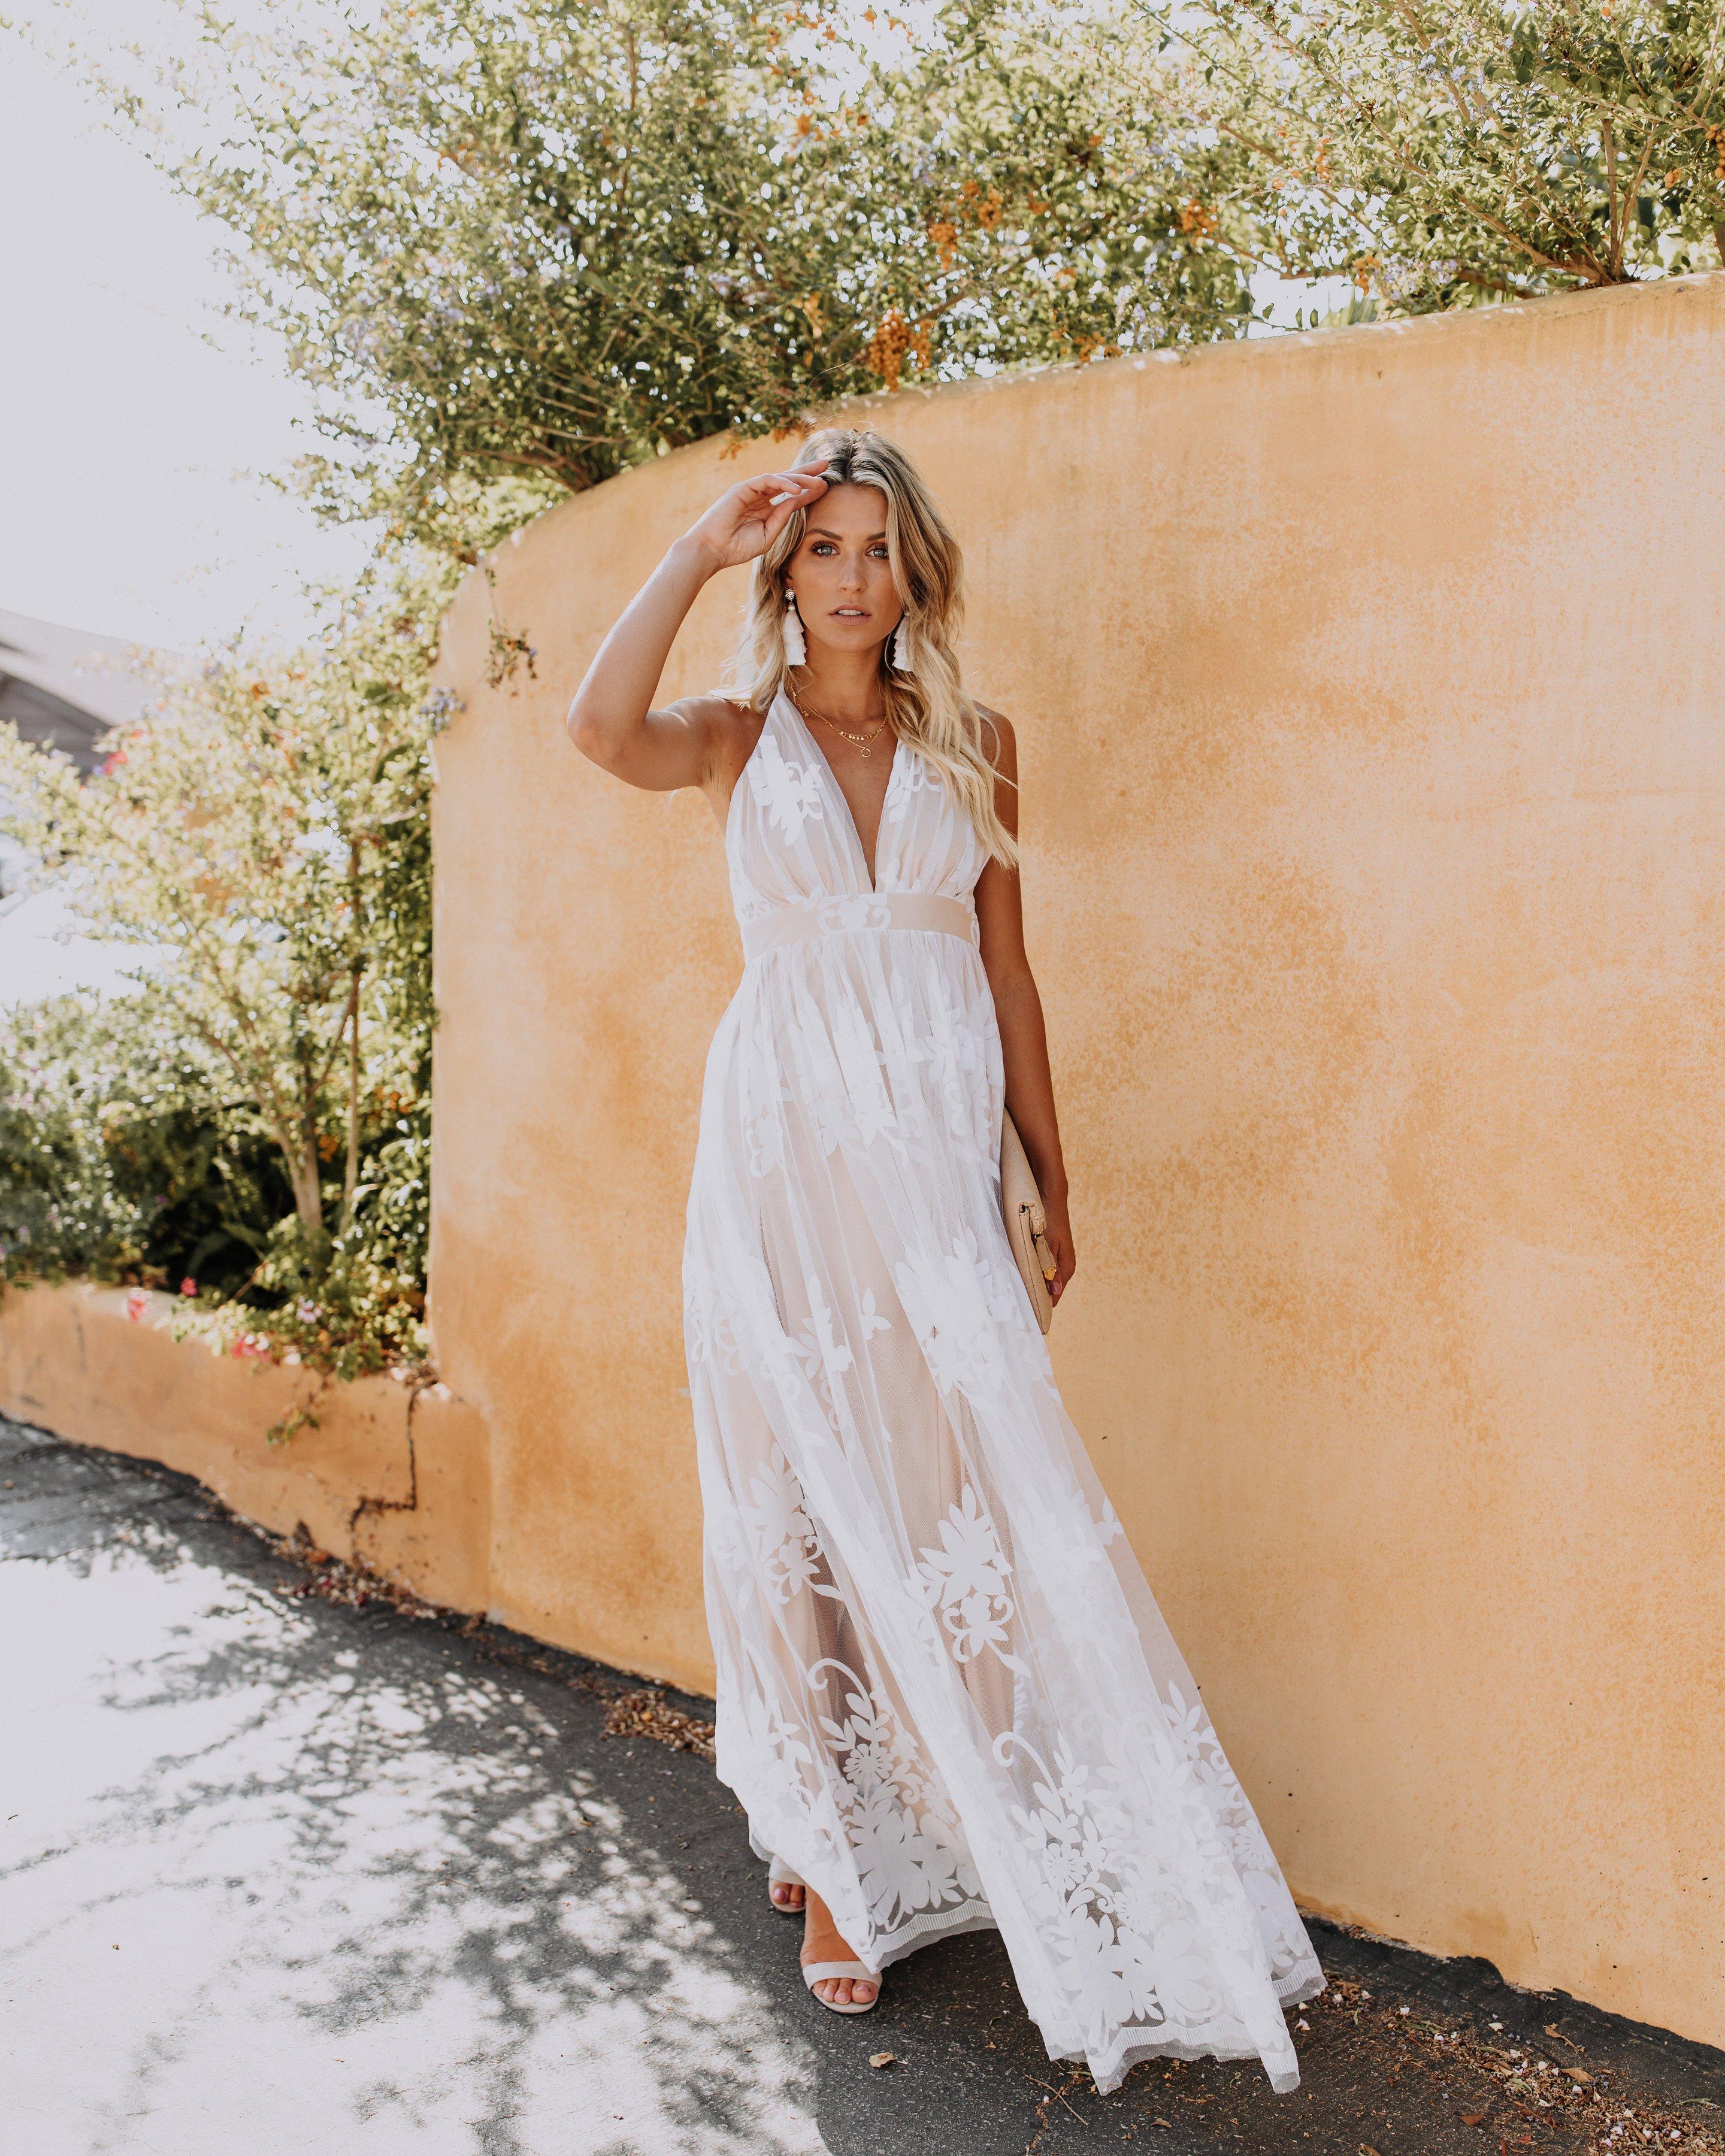 5a7f32c6d35 PREORDER - Antonia Maxi Dress - White